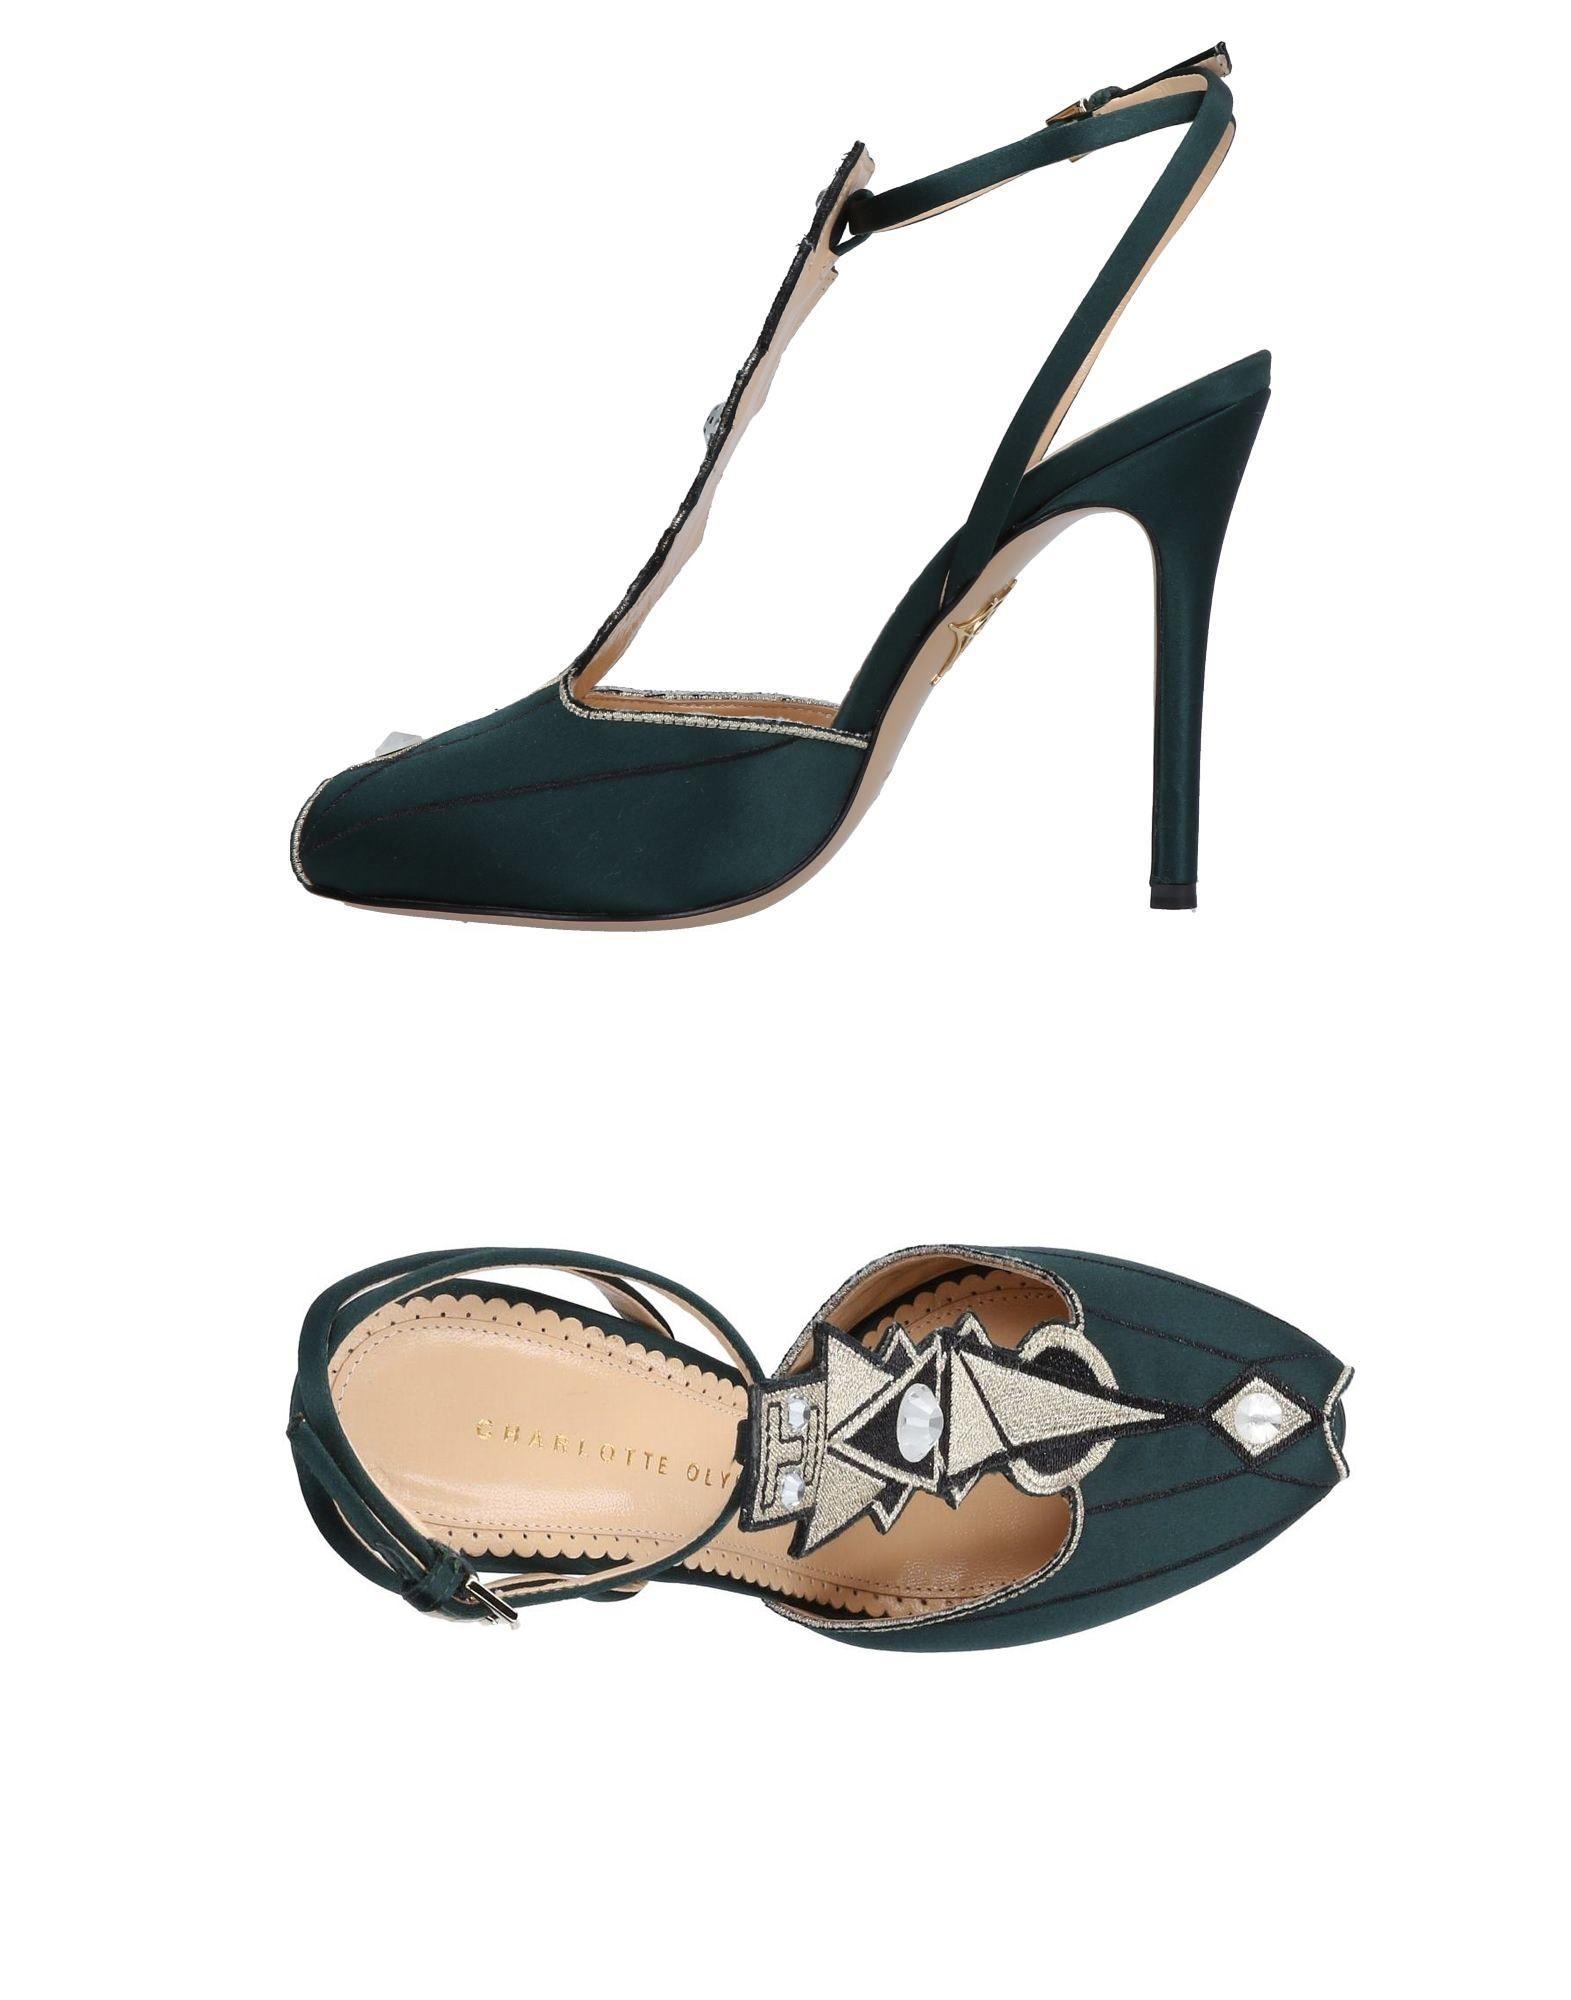 Charlotte Olympia Sandalen Damen  11510162KKGut aussehende strapazierfähige Schuhe